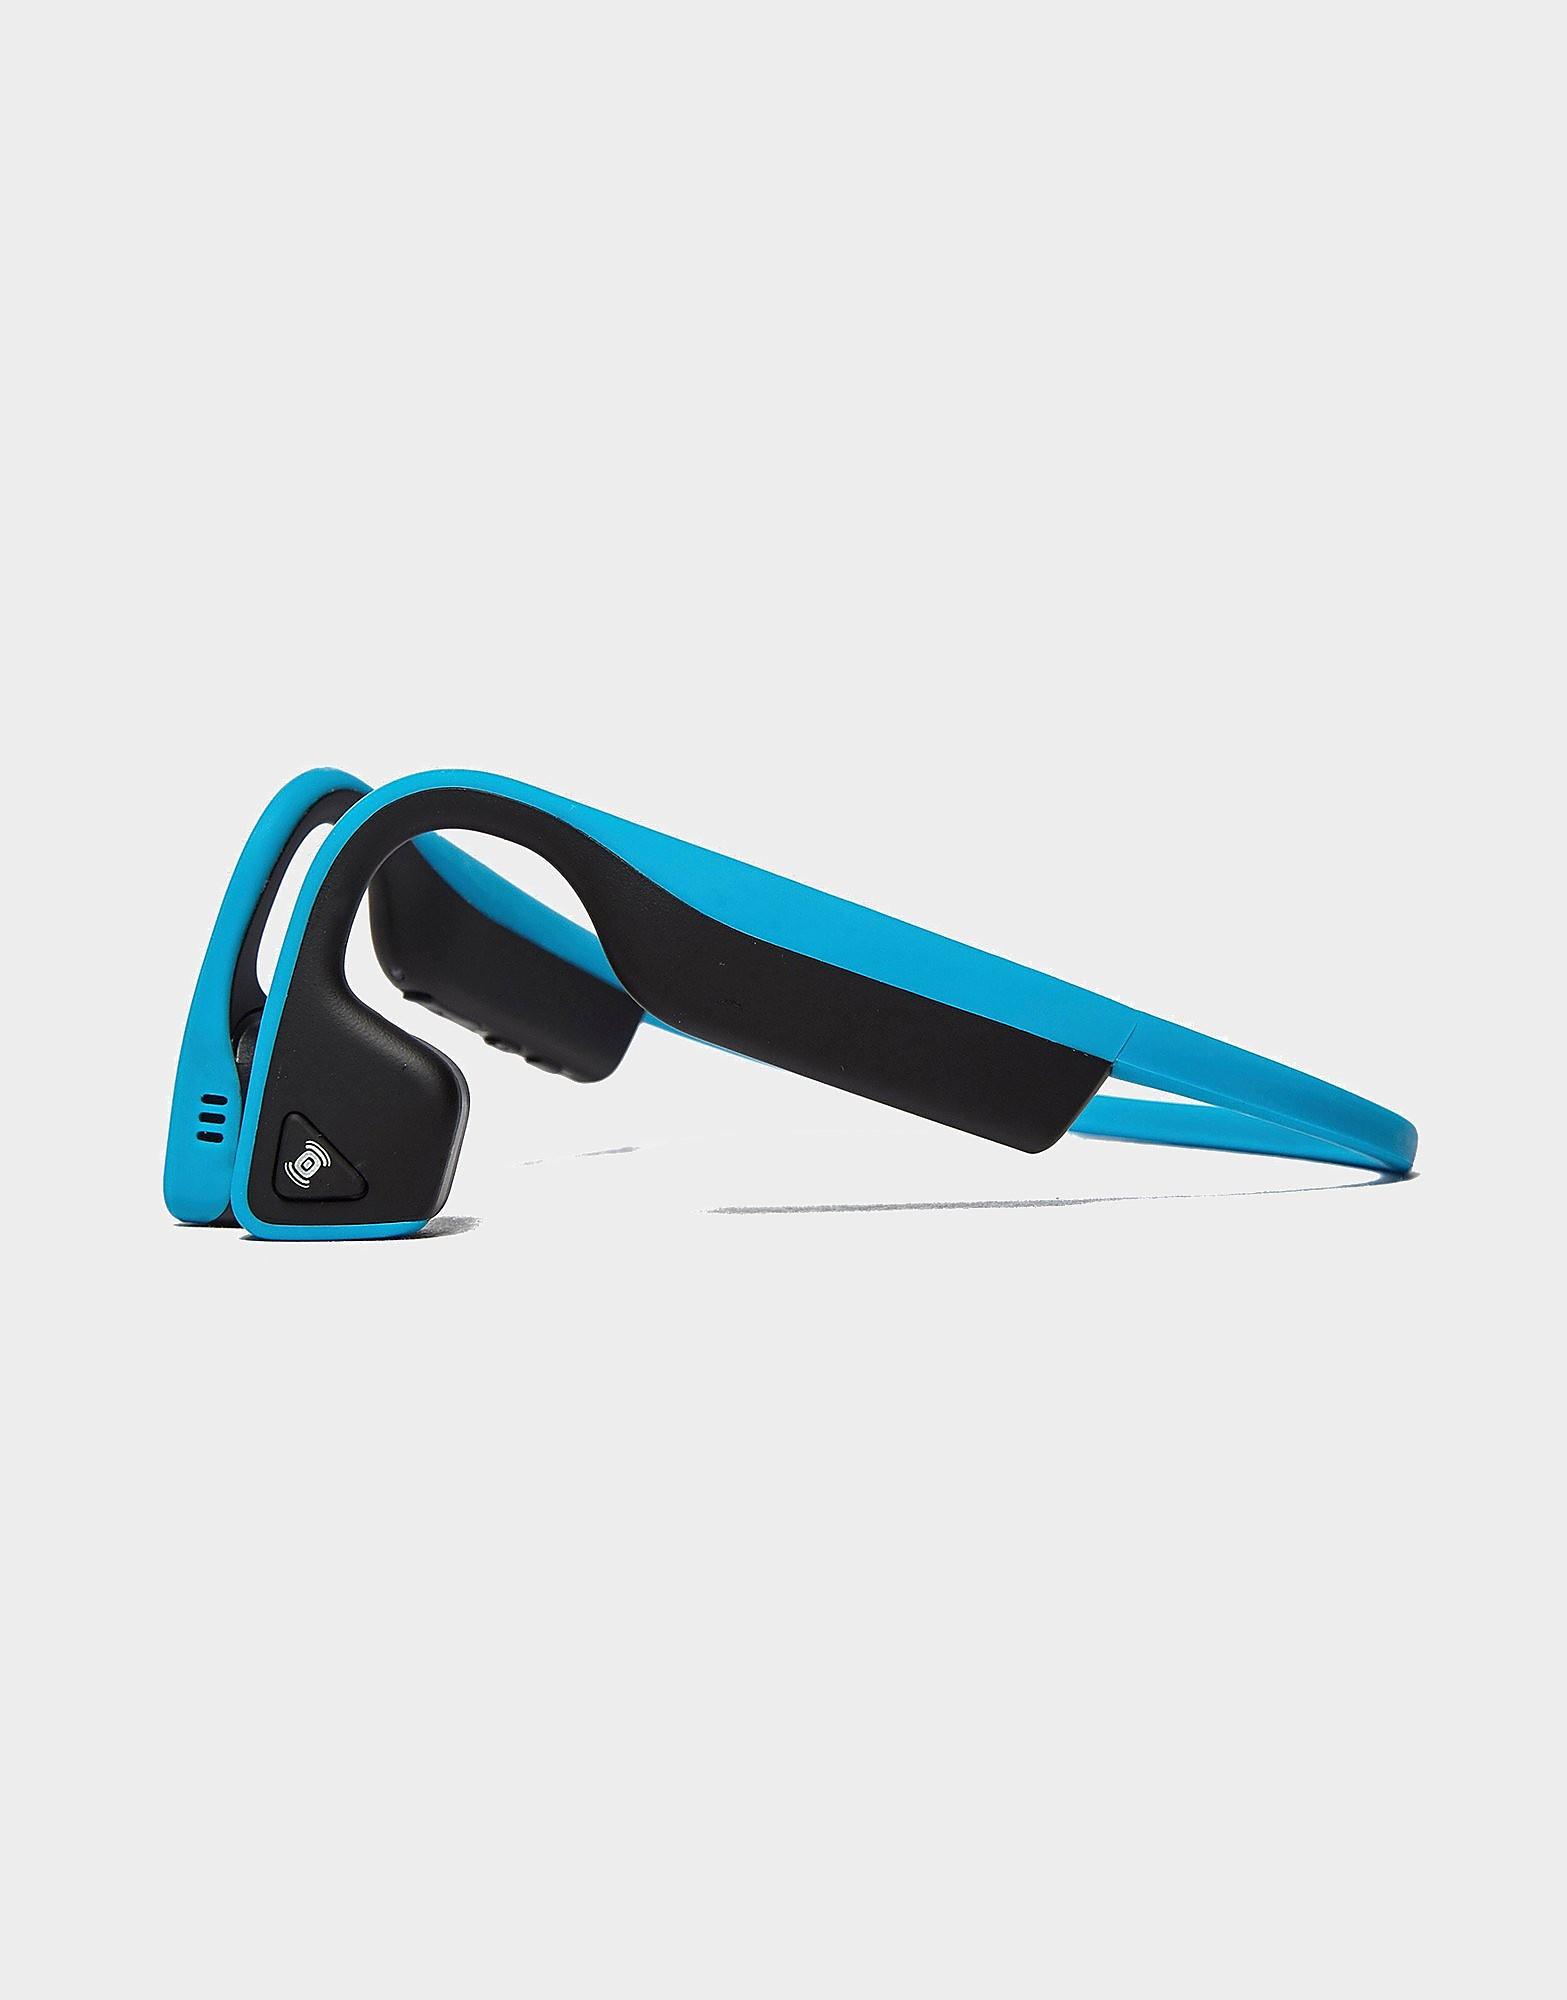 Aftershokz Trekz Titanium Running Headphones